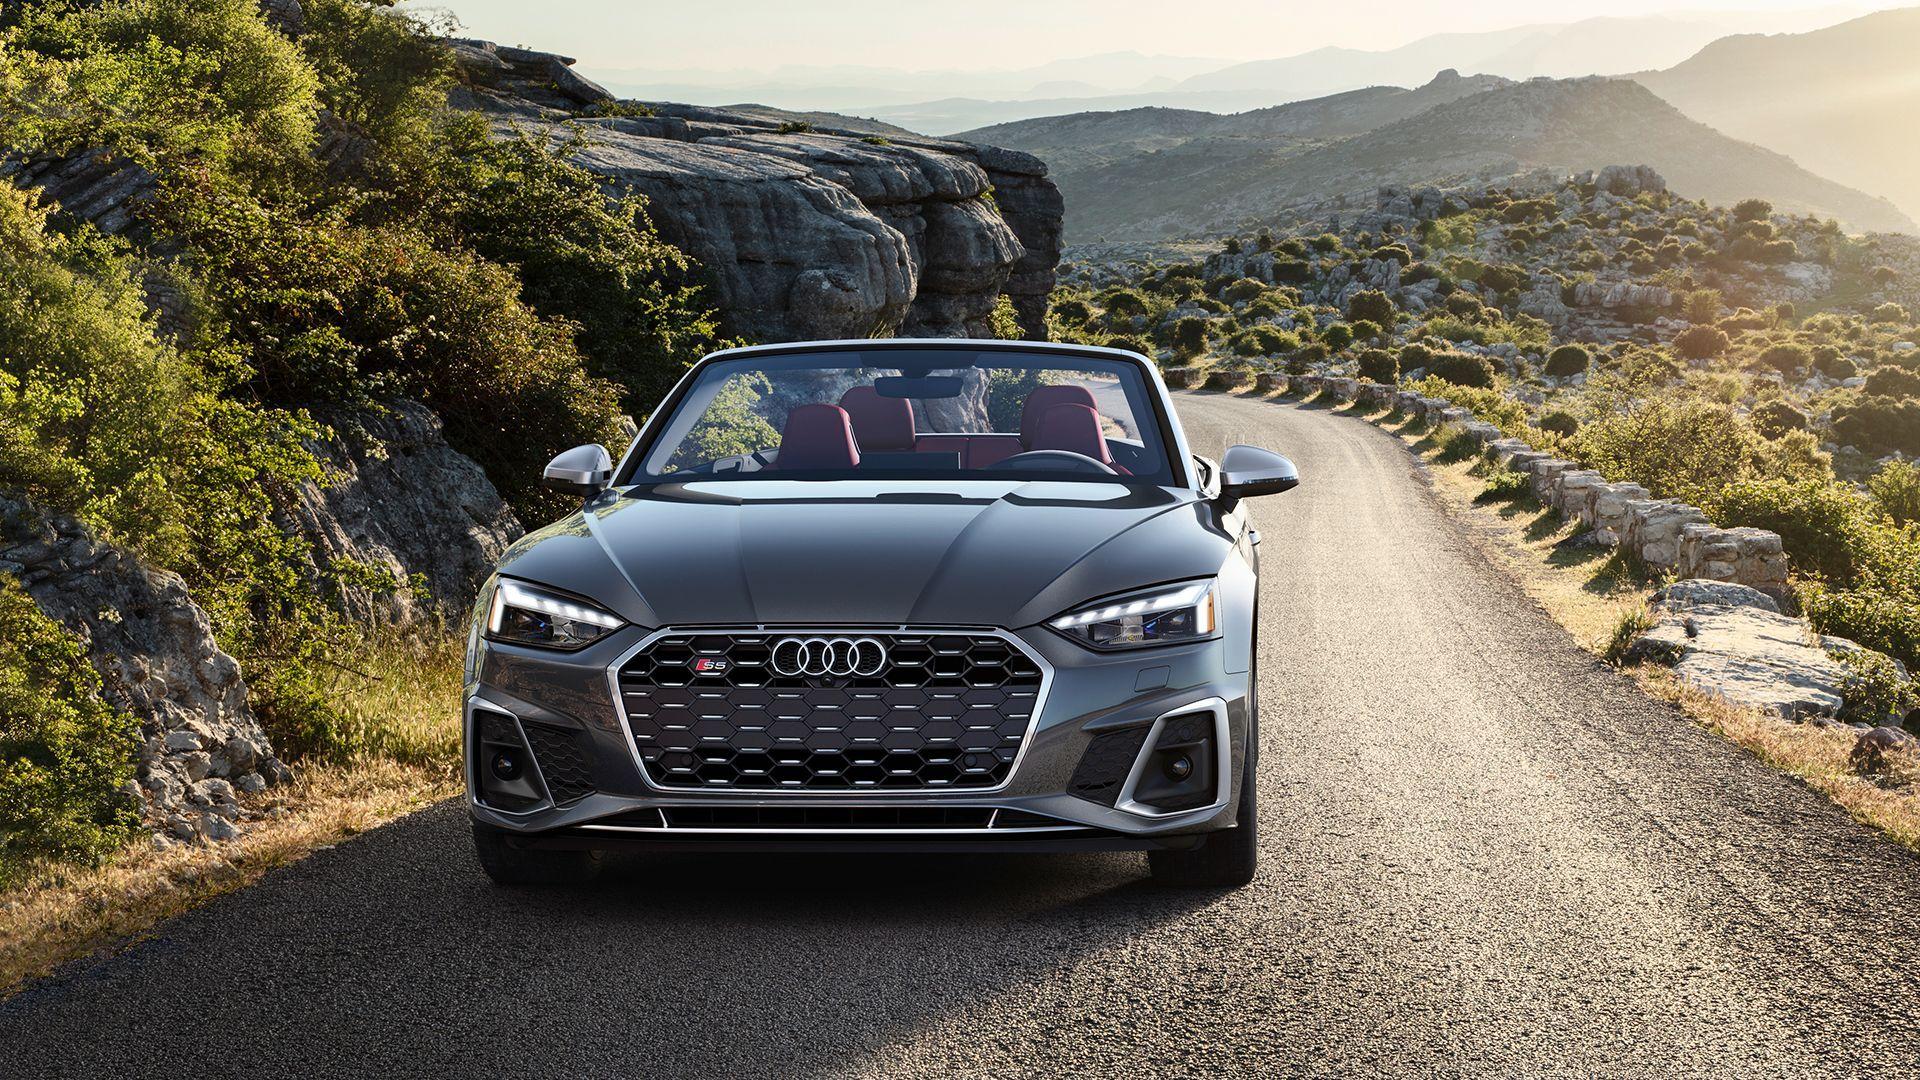 2021 Audi S5 Cabriolet Luxury Coupe Audi Usa